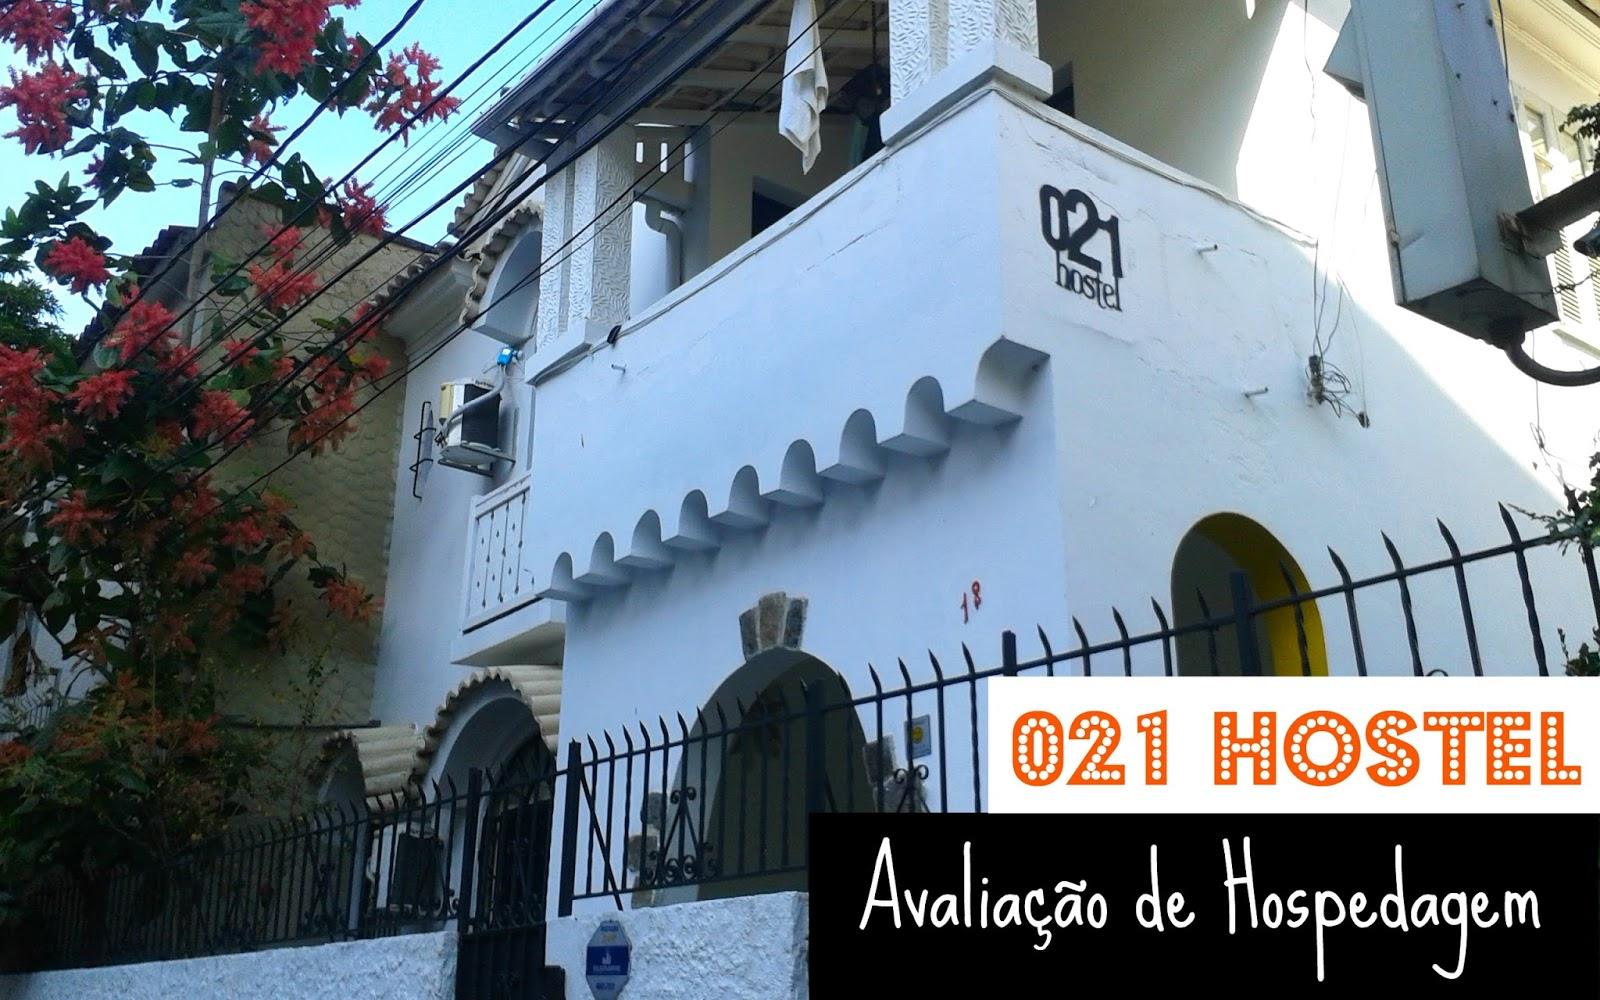 021 hostel